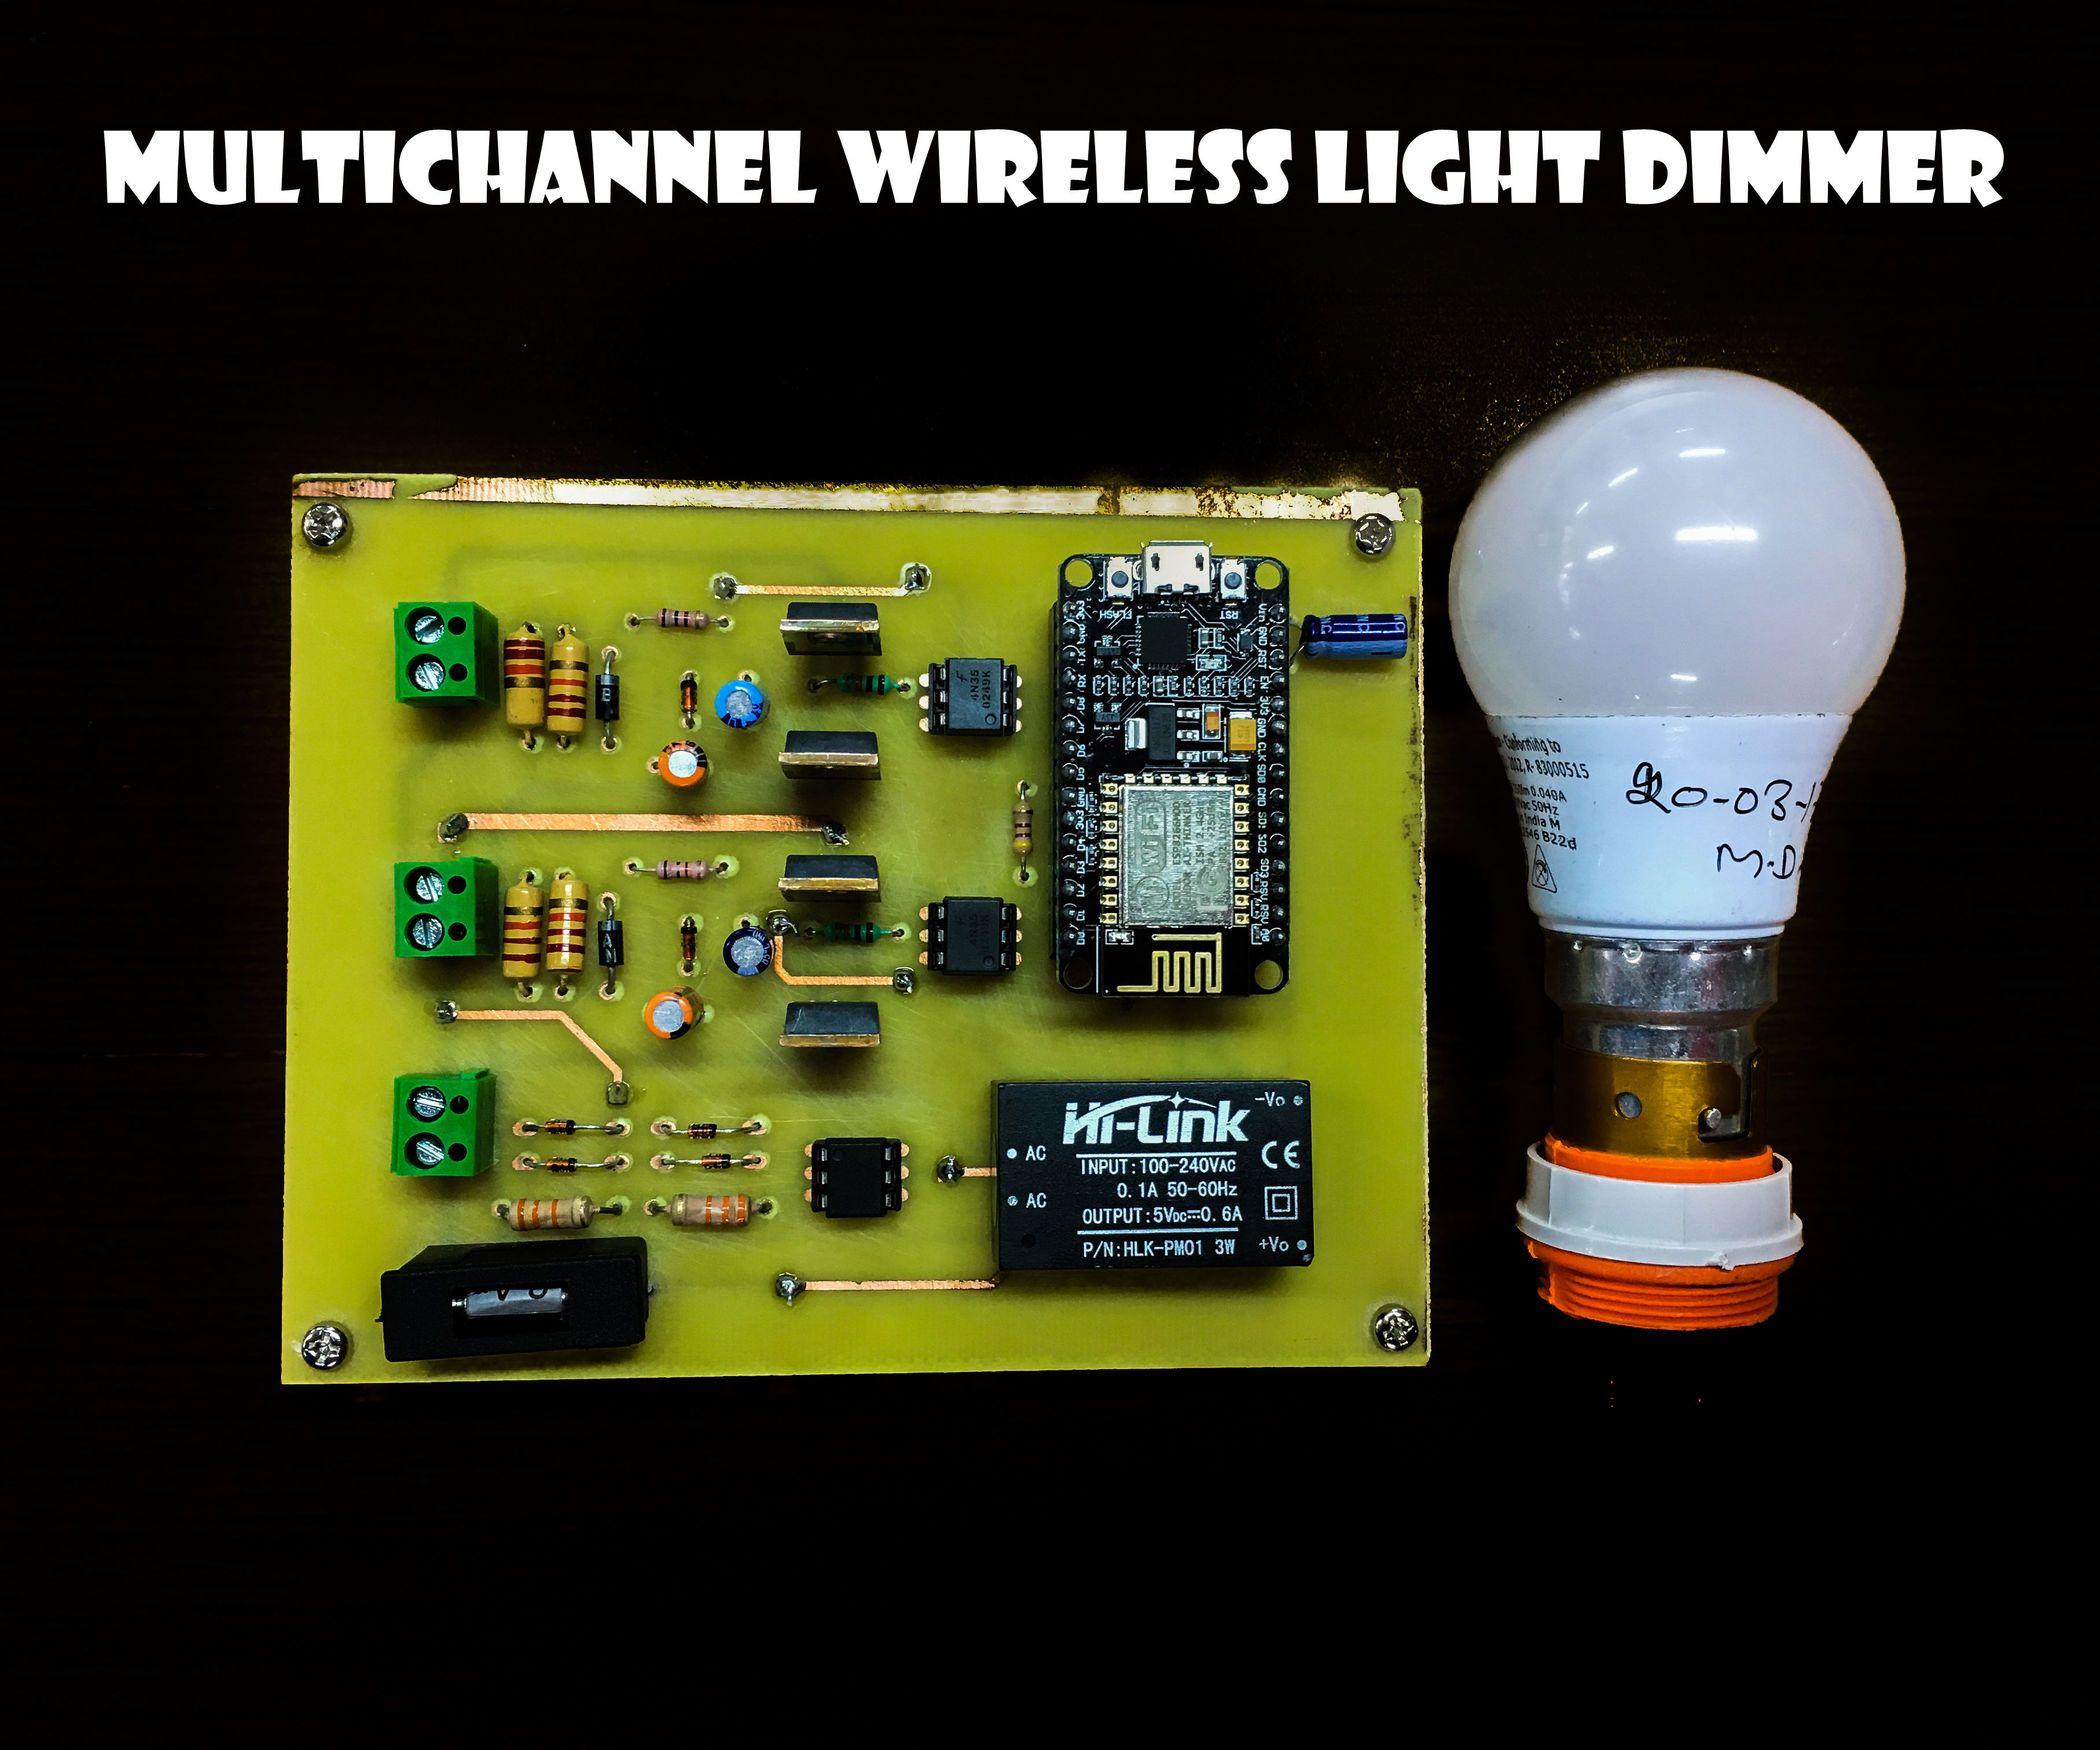 Multichannel Wireless Light Dimmer Wireless Lights Dim Lighting Dimmer